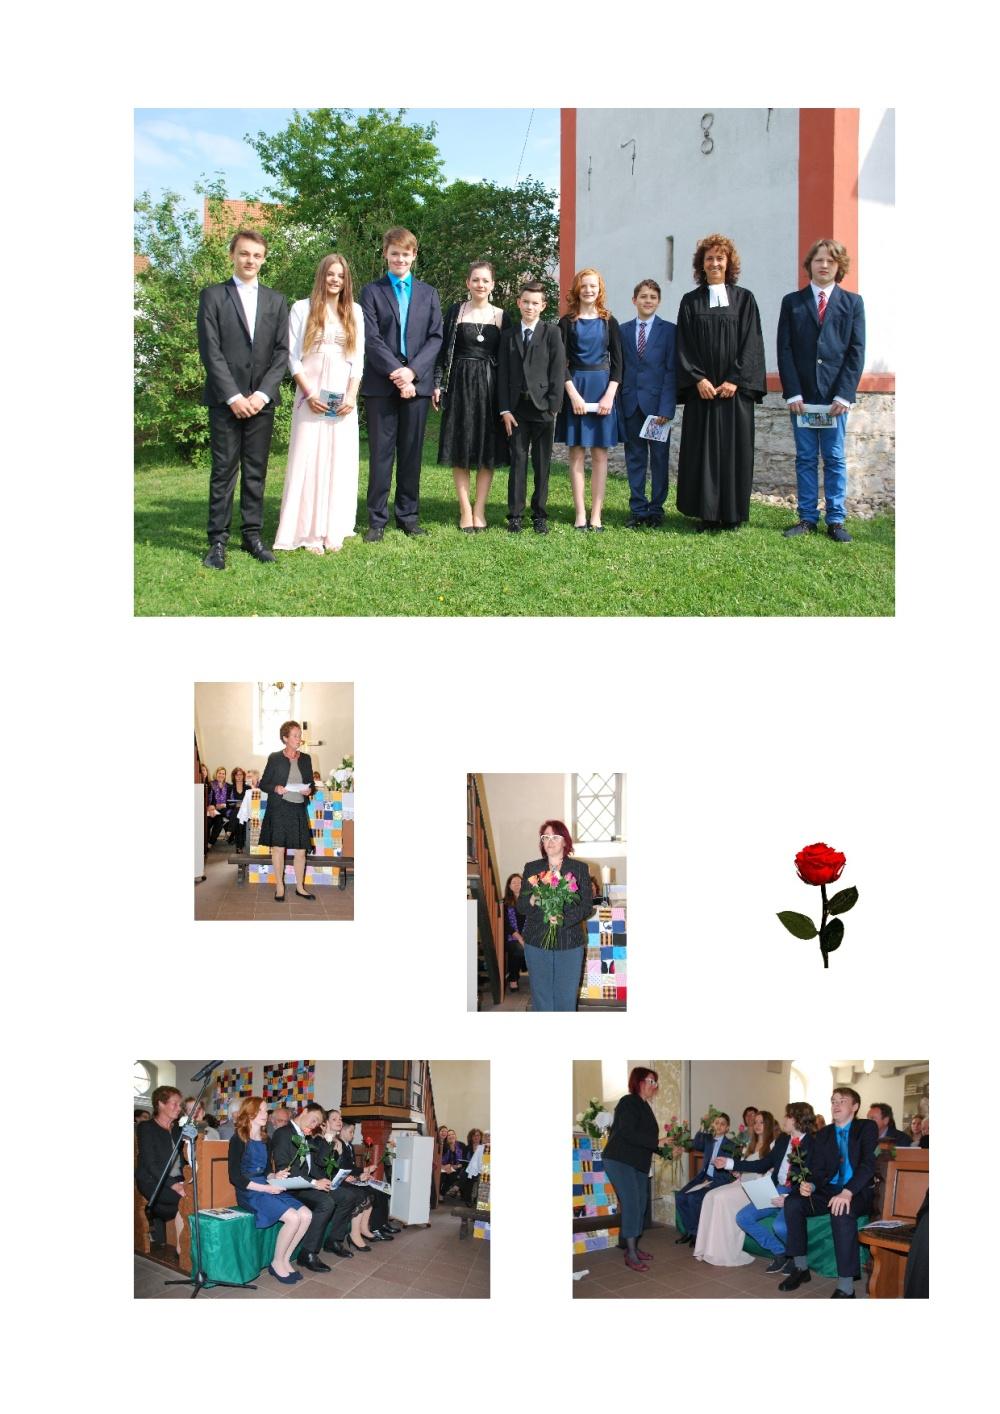 2015-05-17 Konfirmation-003